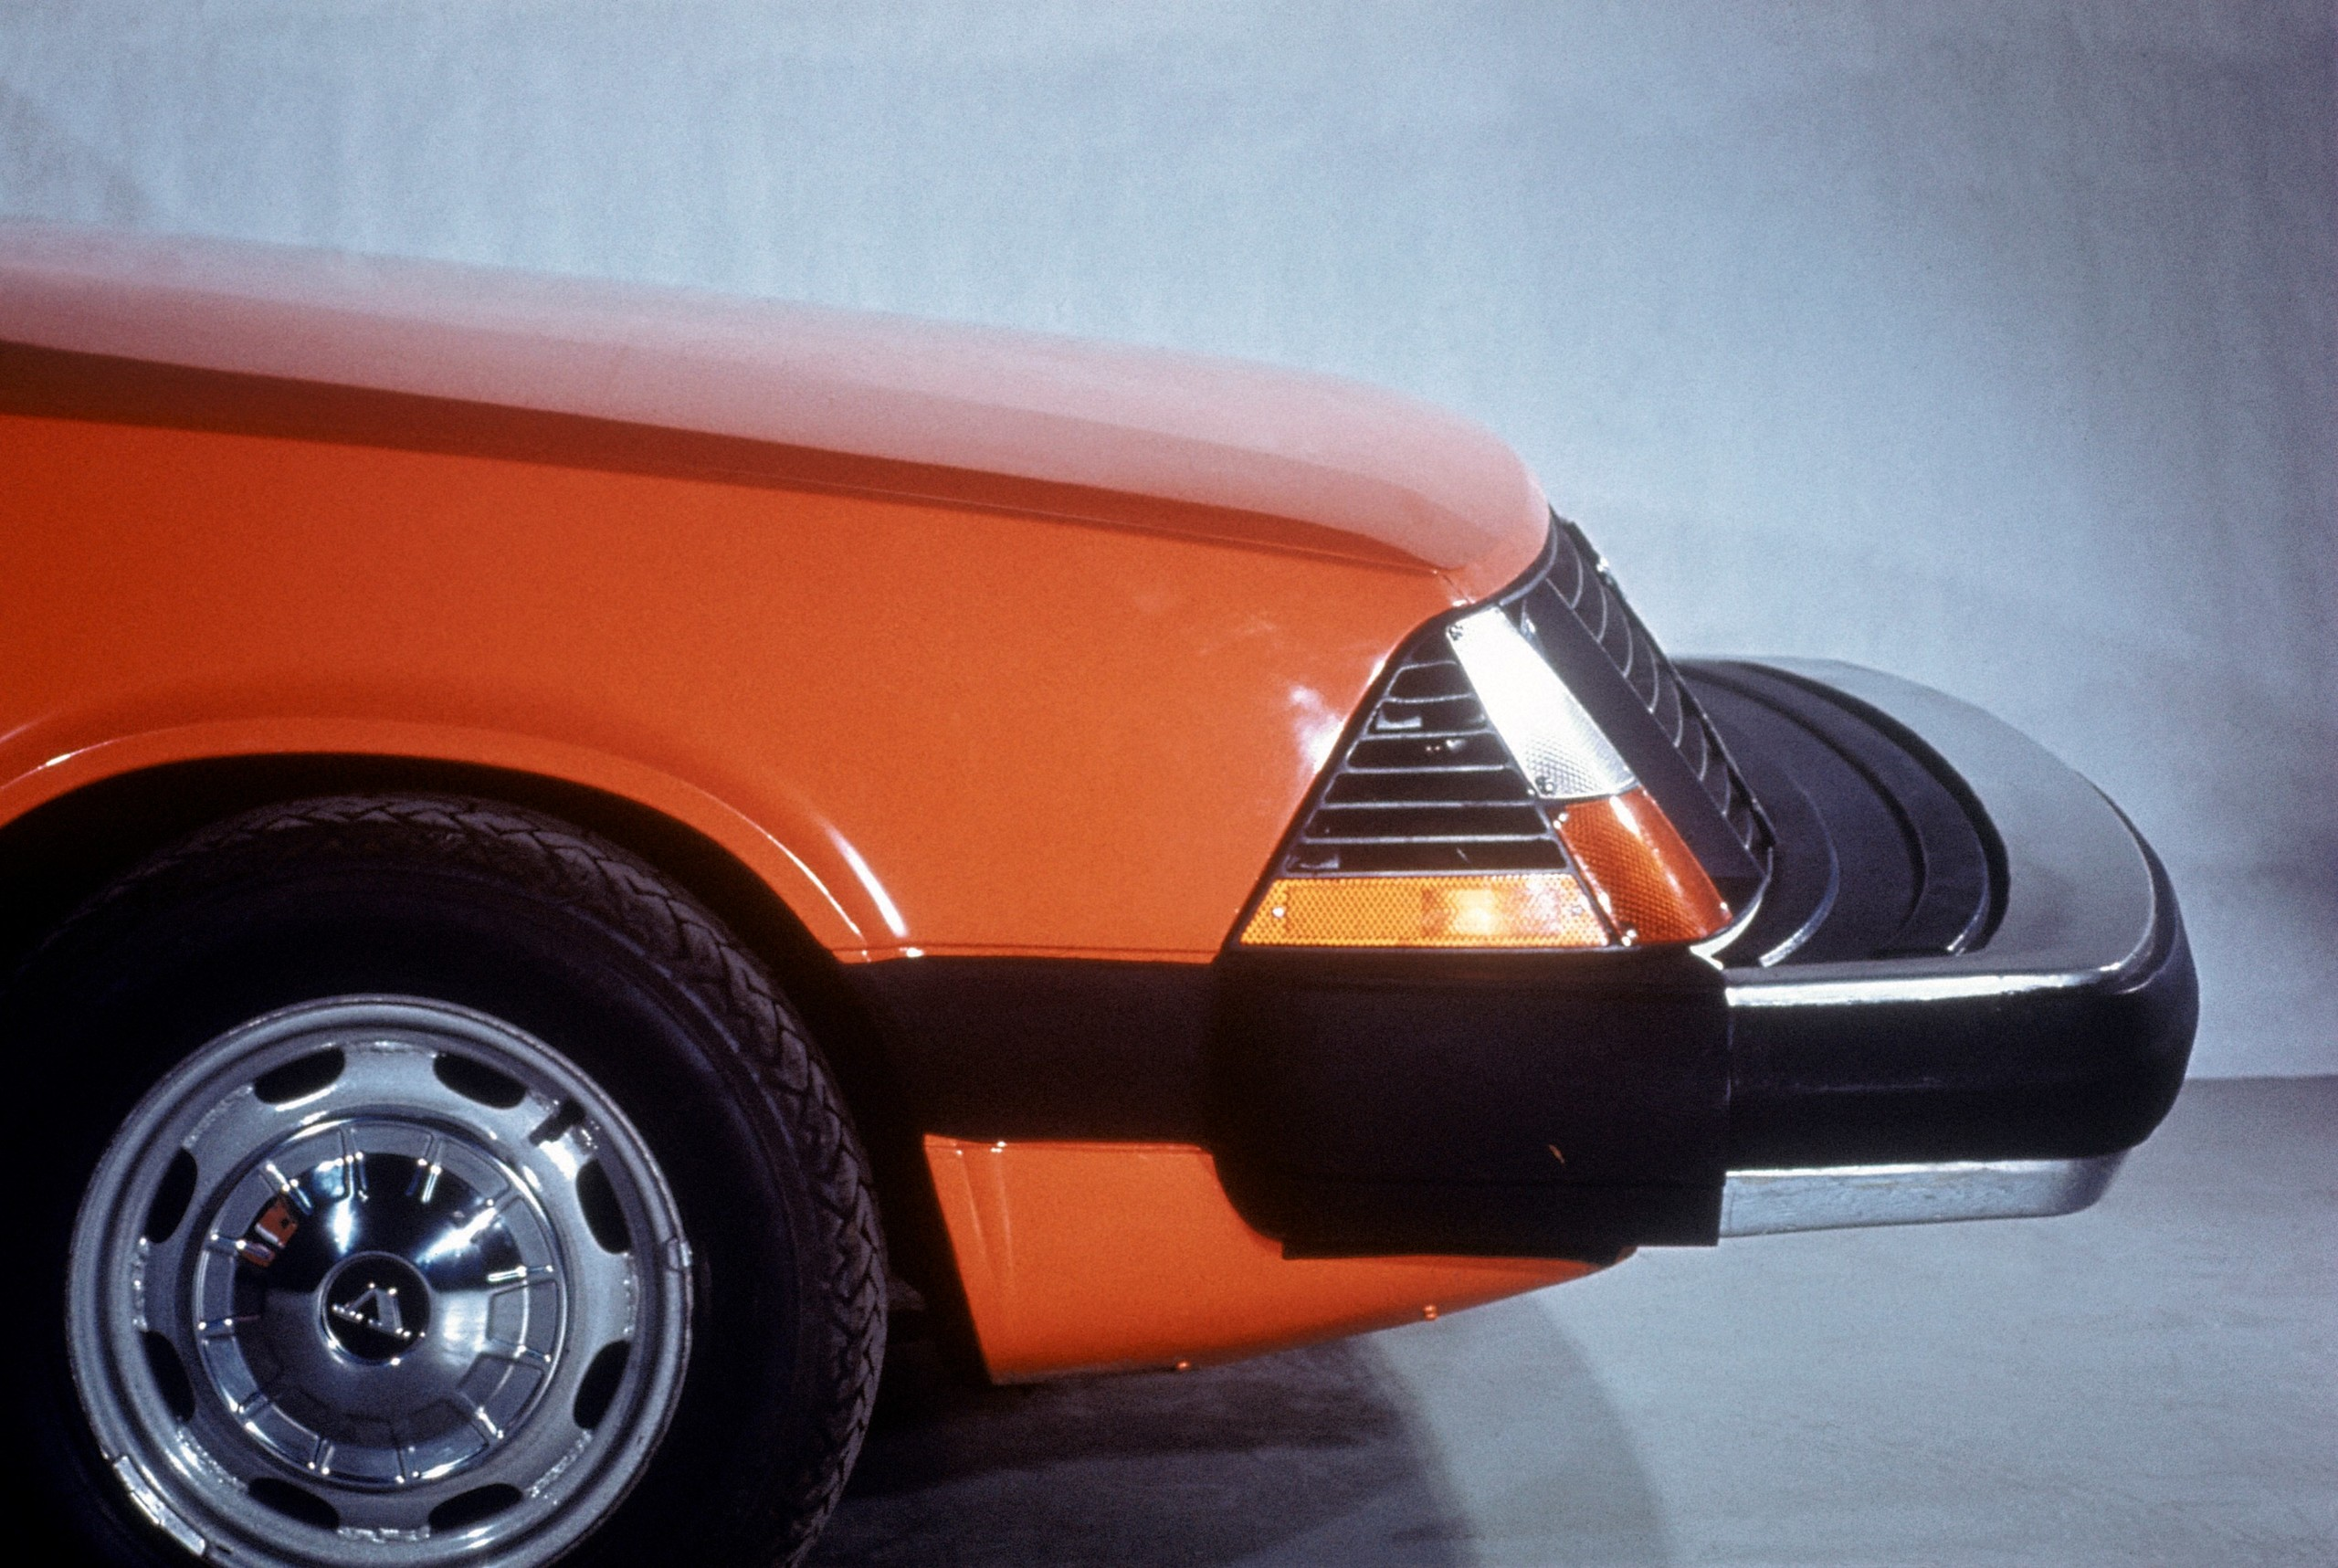 Volvo Experimental Safety Car 1972